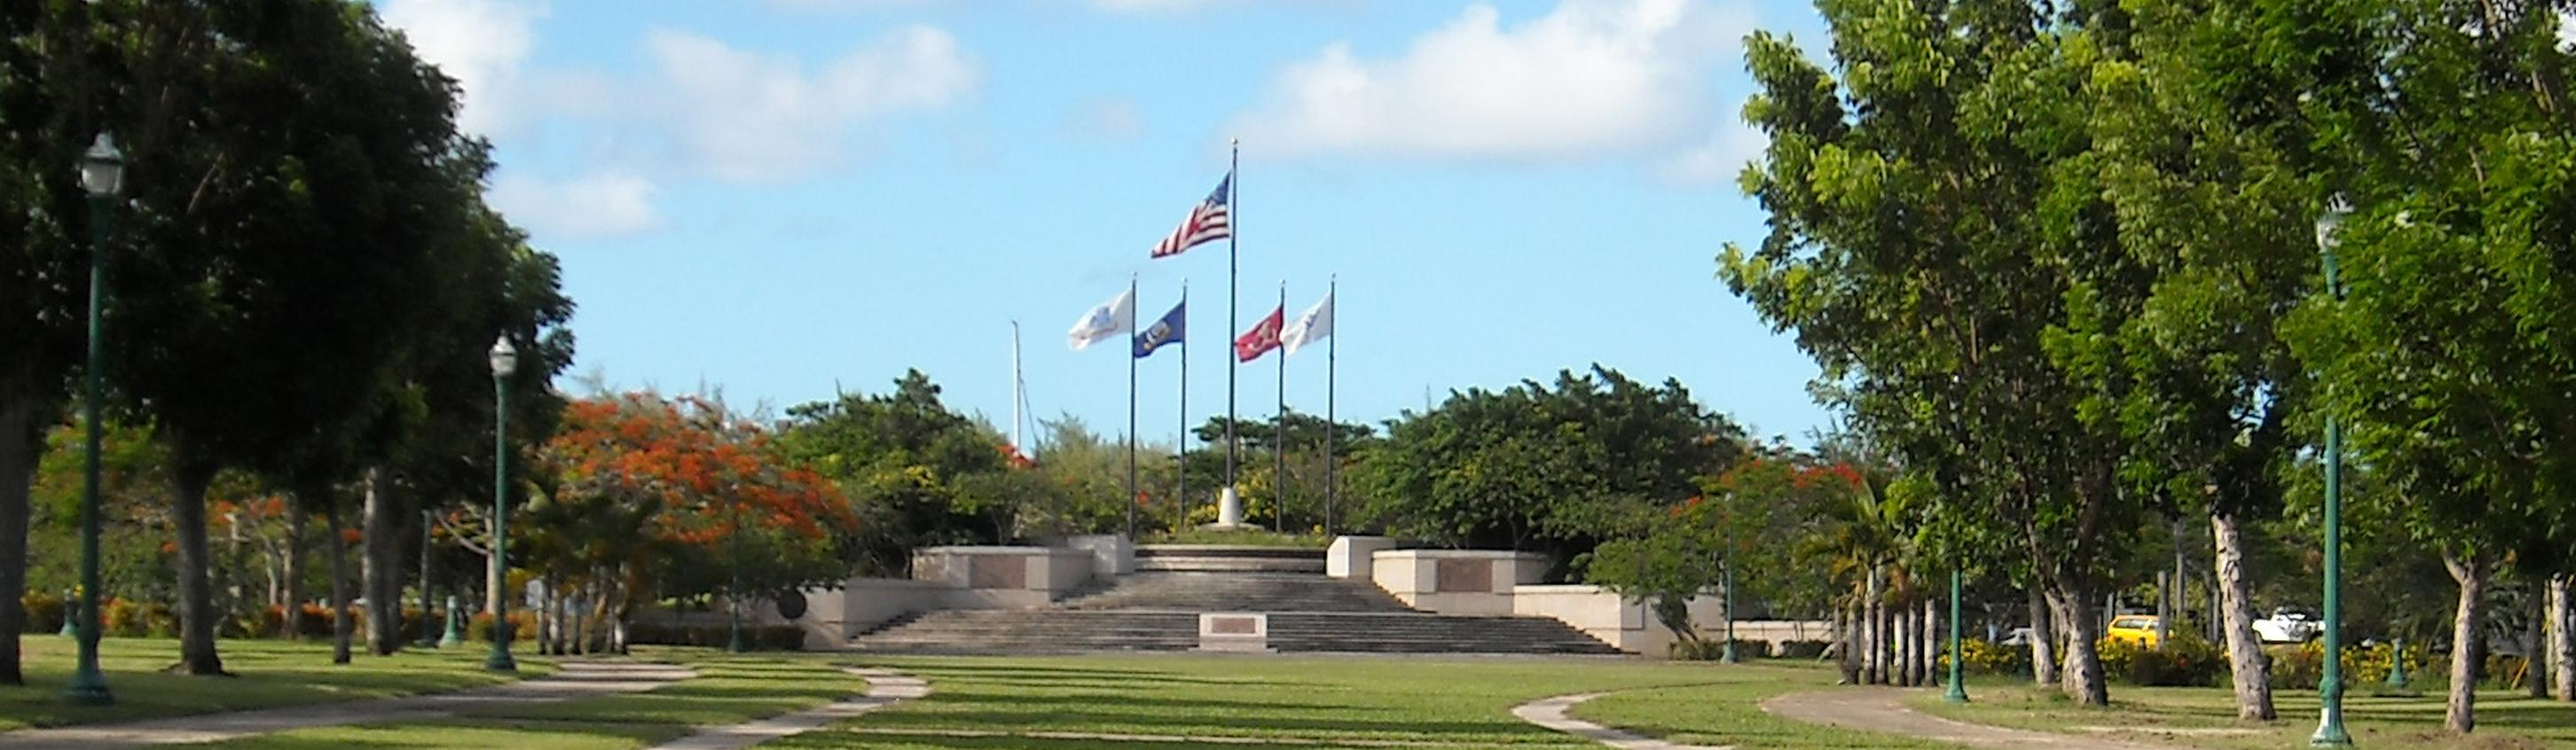 american memorial park  u s  national park service